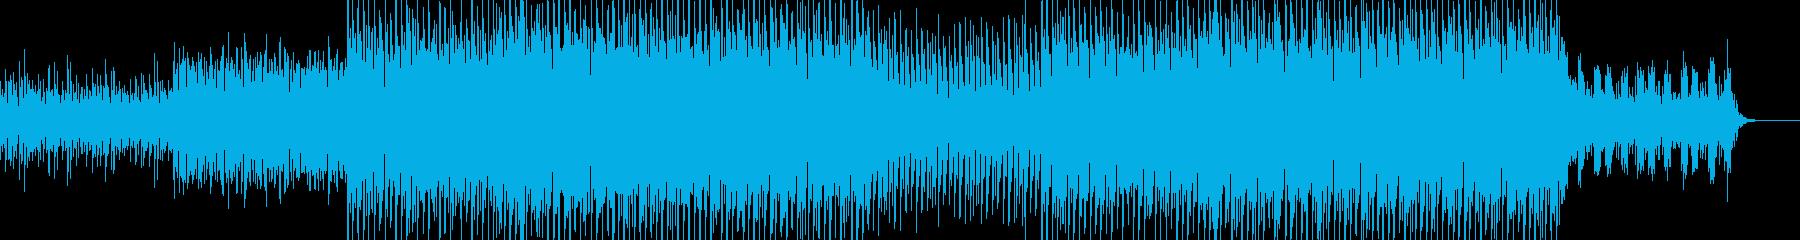 EDMポップで明るいクラブ系-37の再生済みの波形